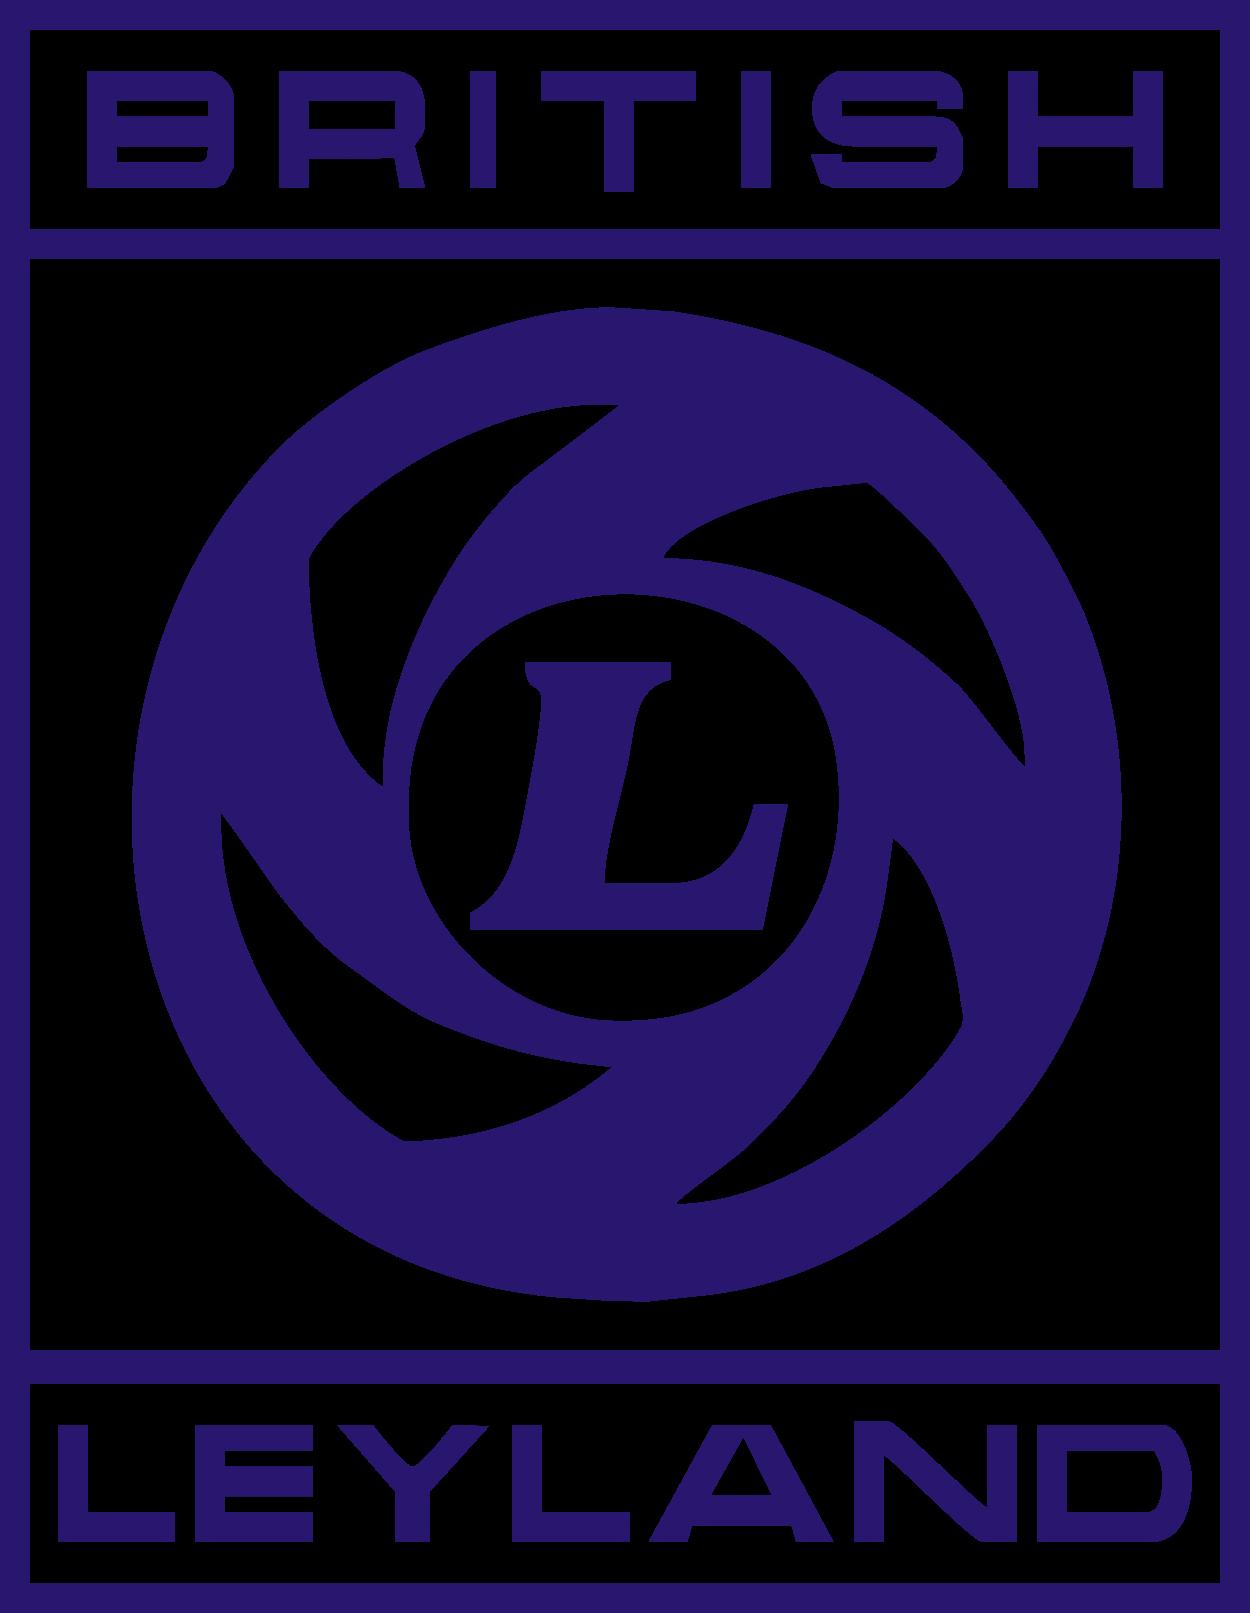 medium resolution of british leyland logo